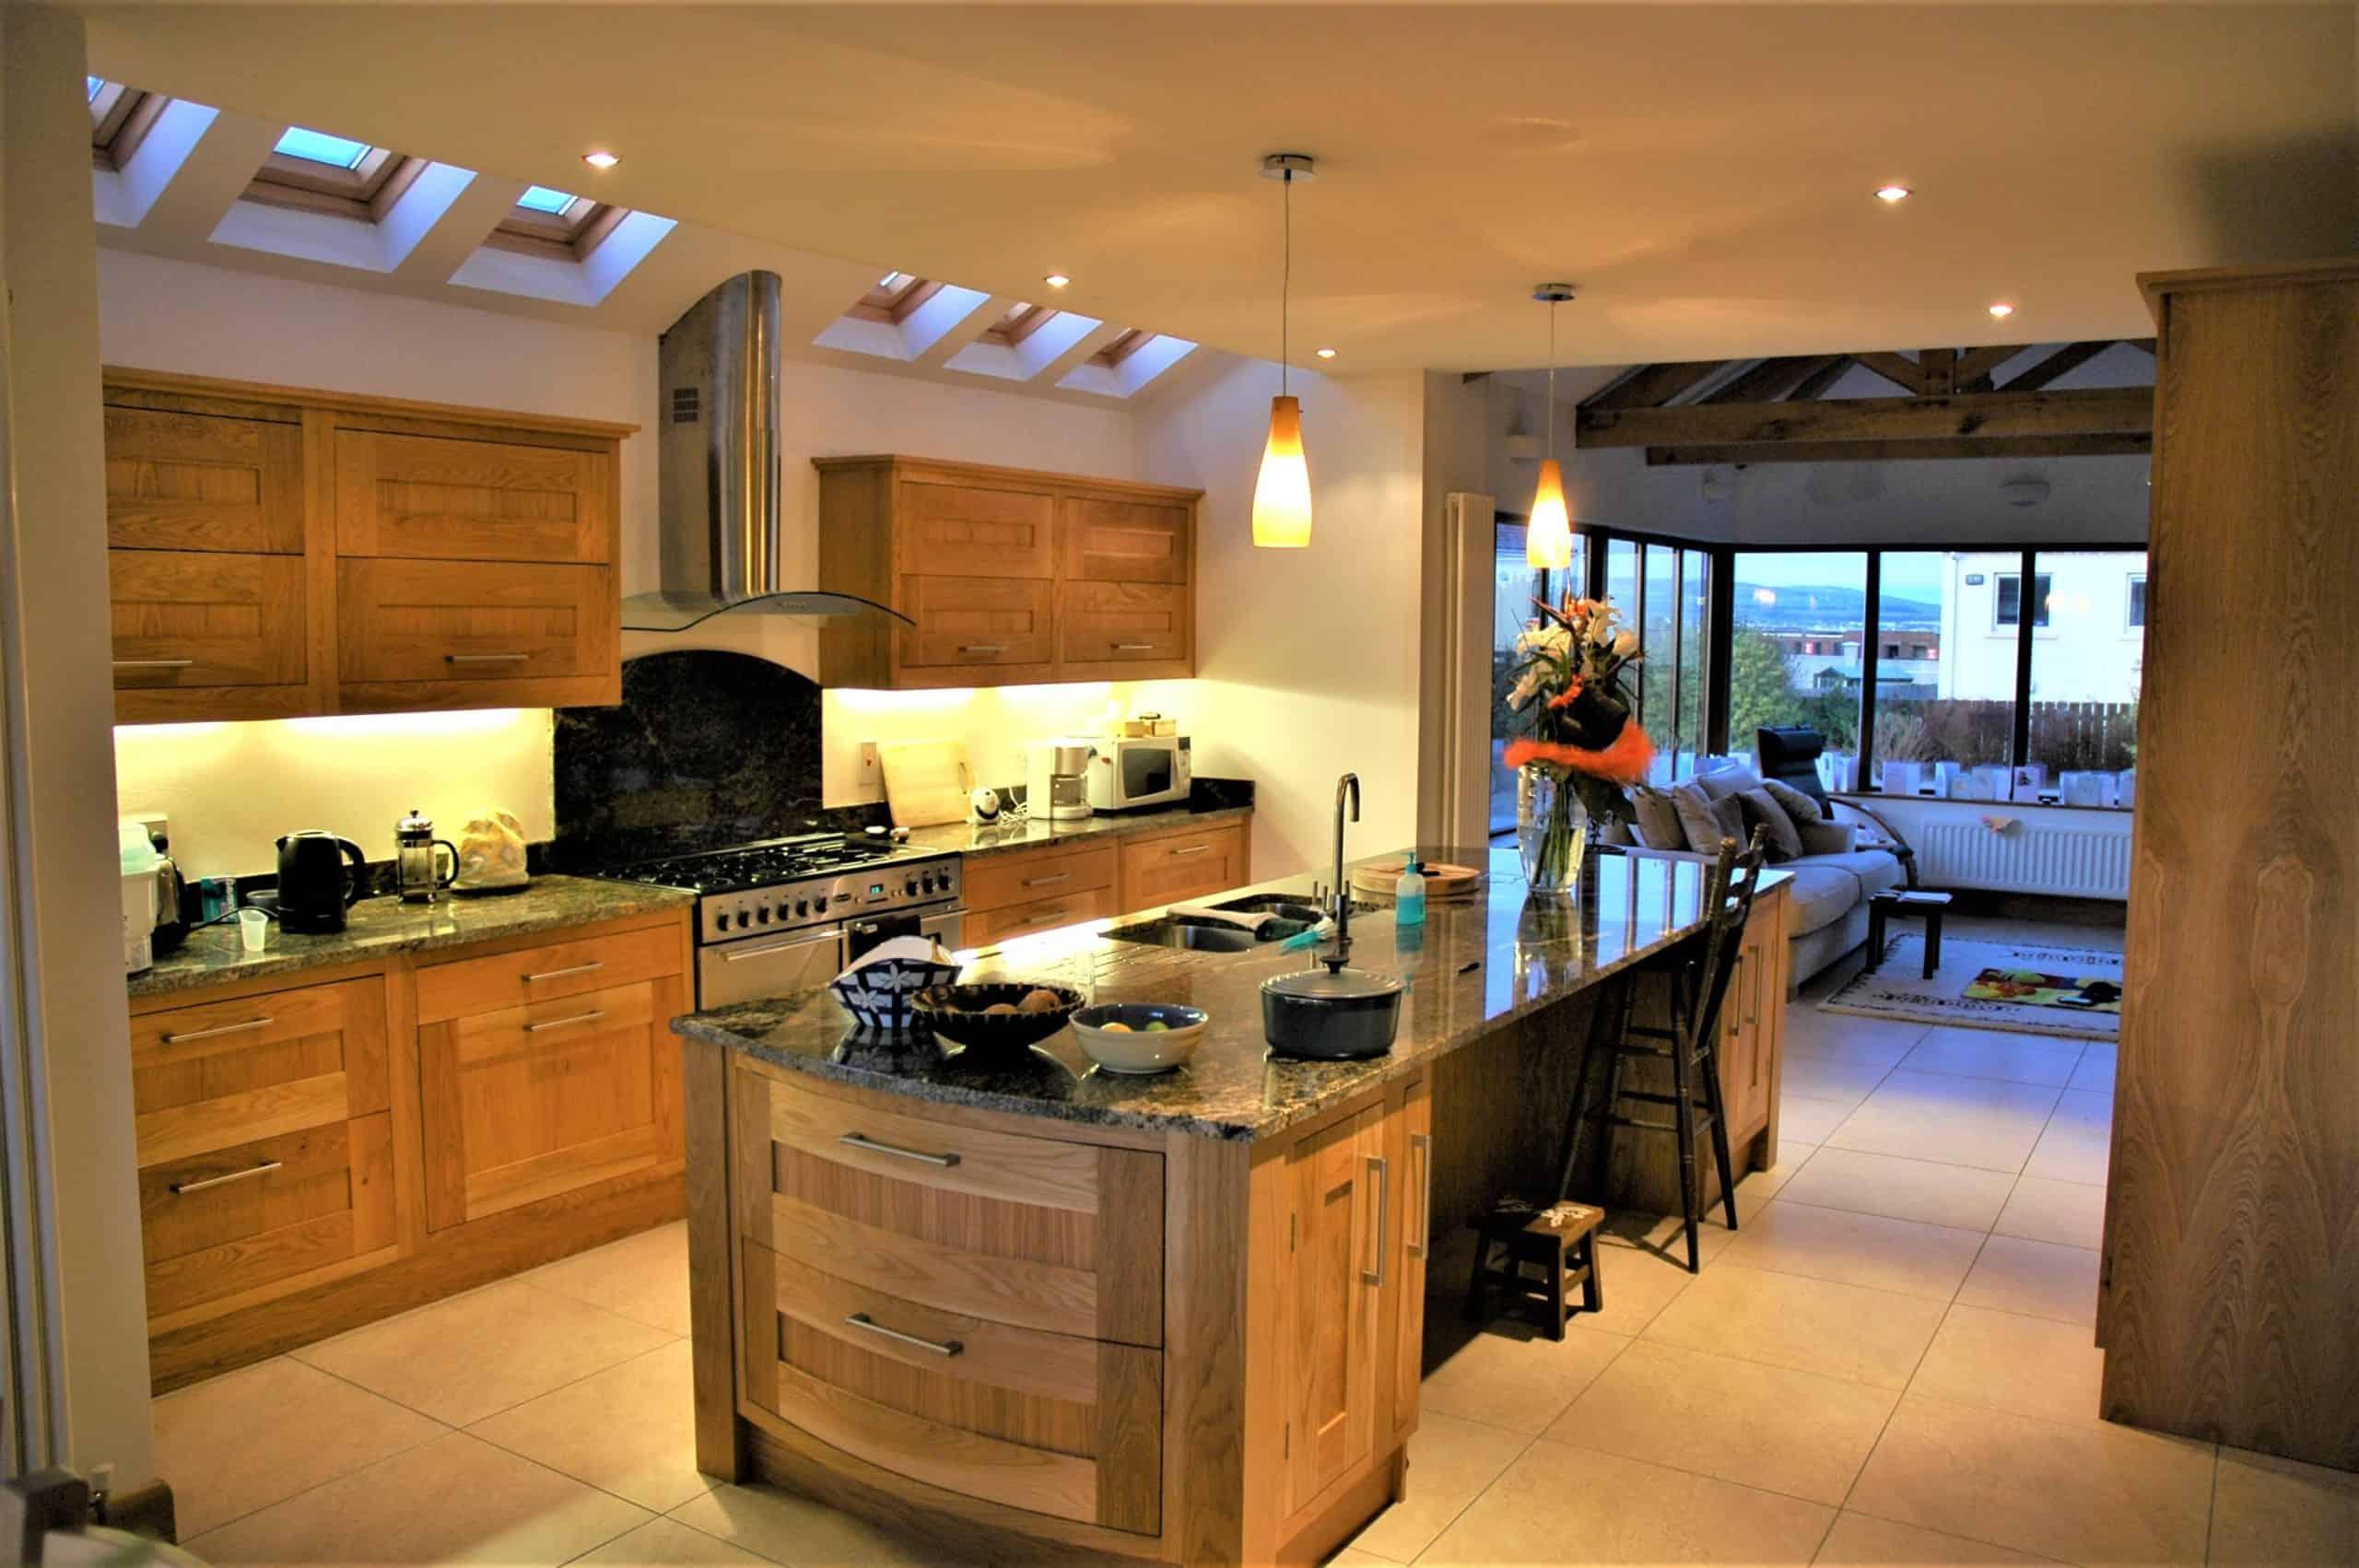 Campbell Dwelling - Kitchen